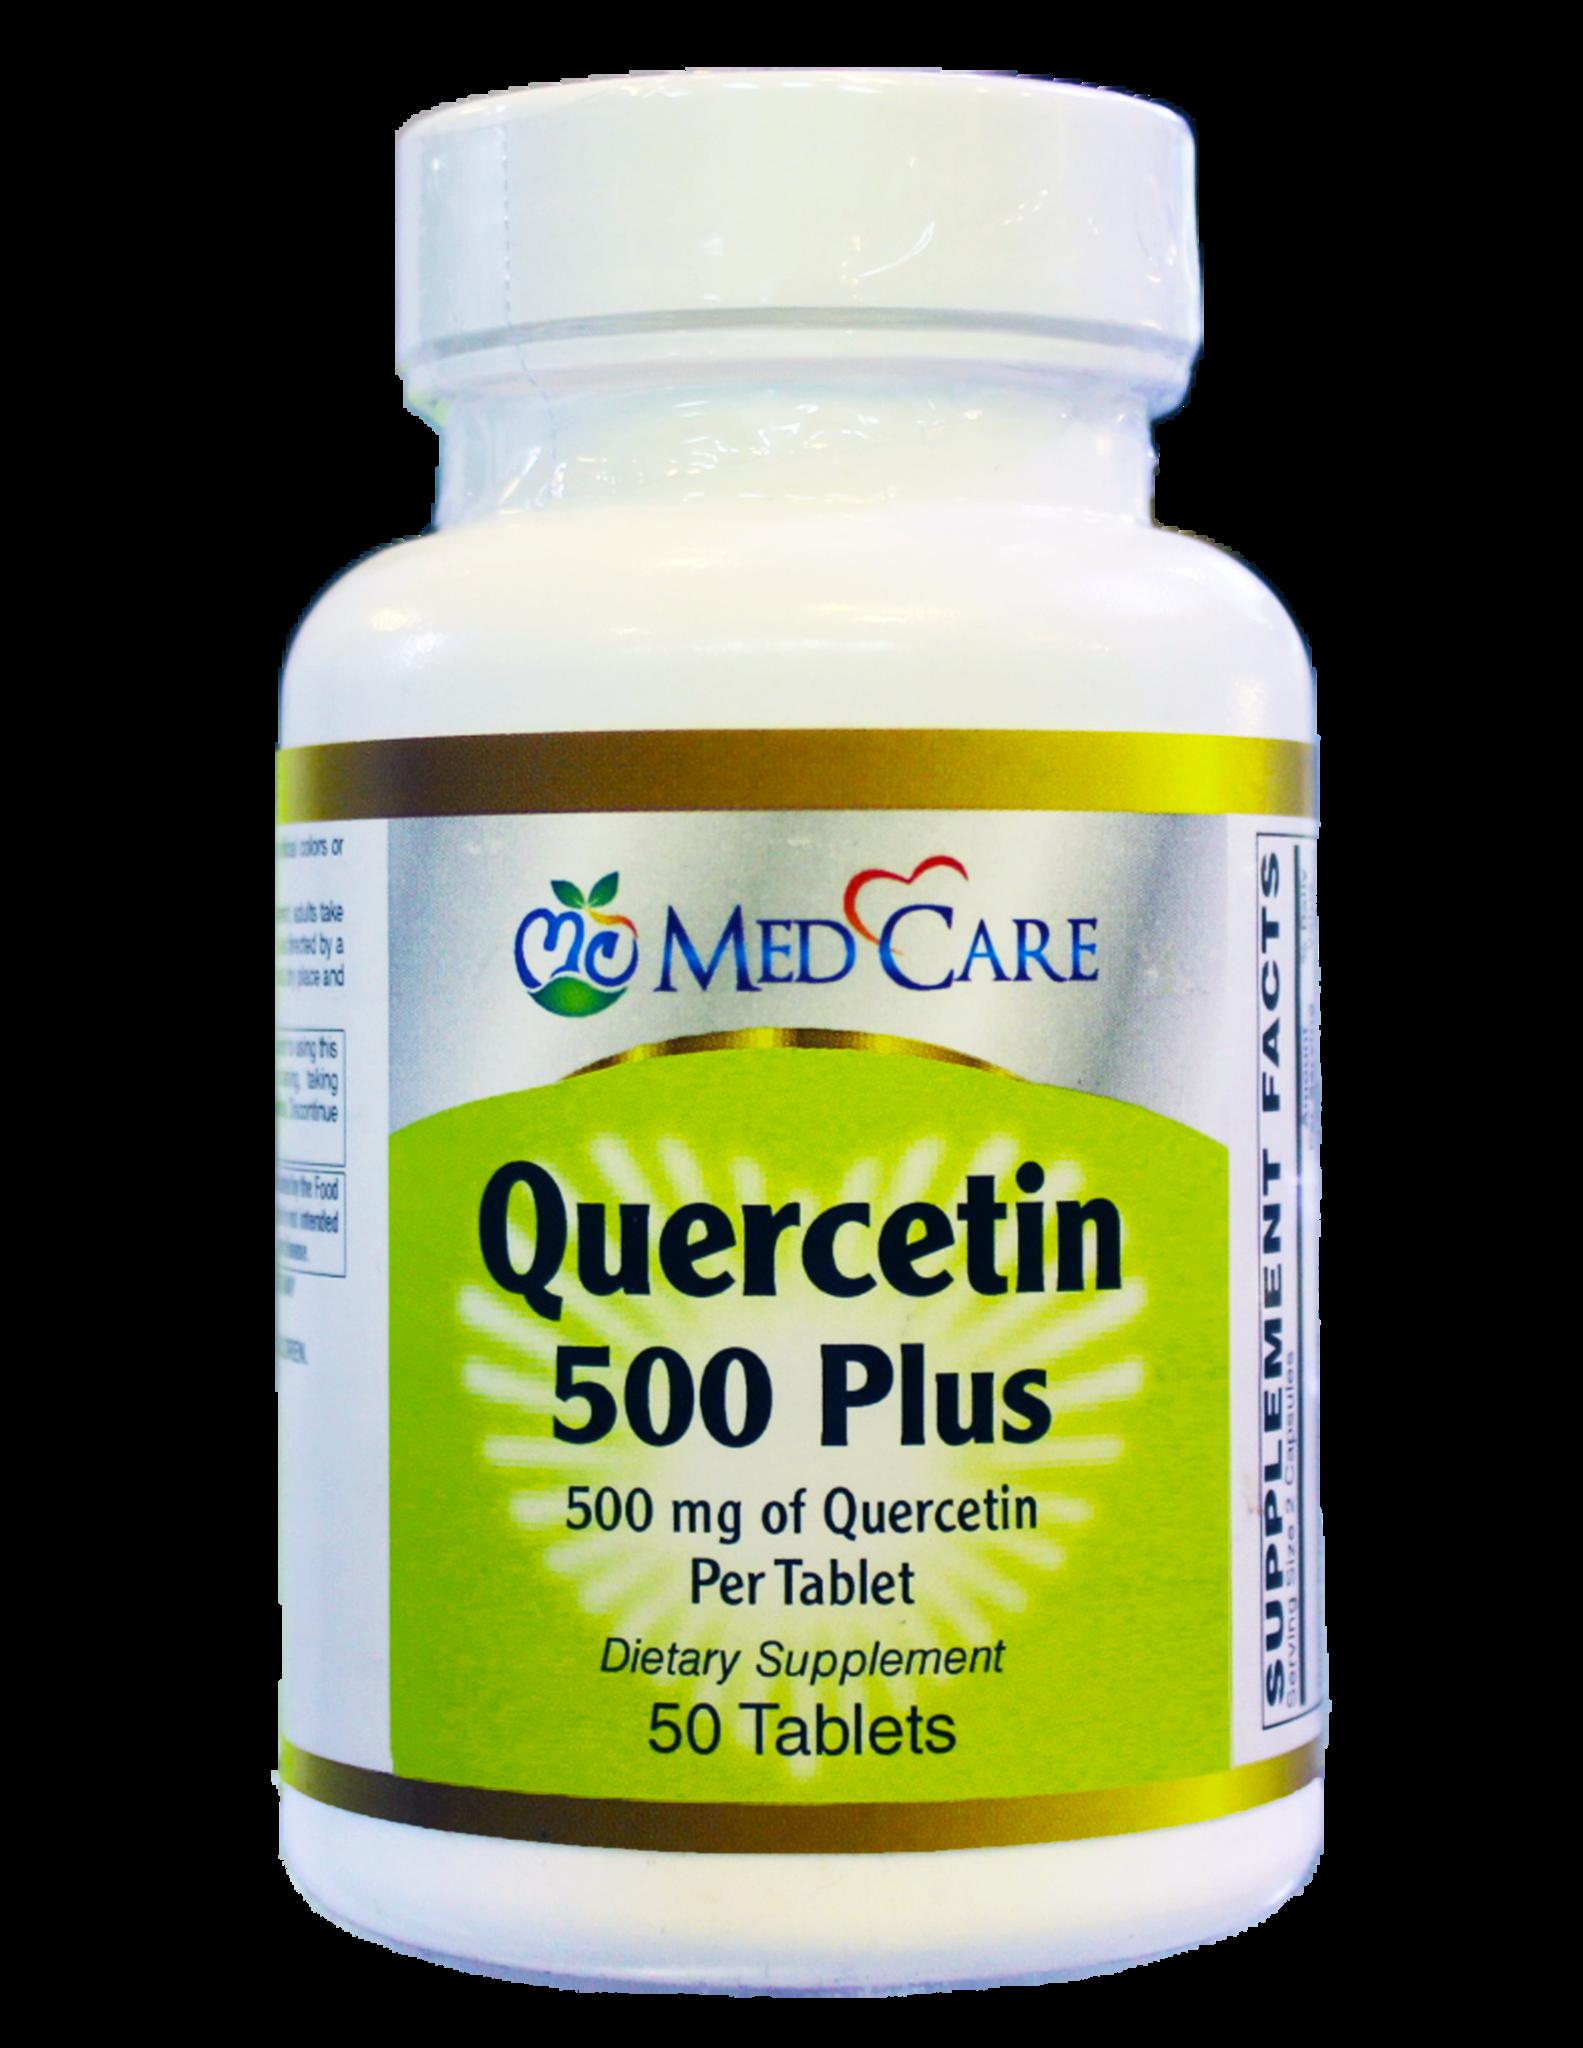 MEDCARE MC QUERCETIN PLUS 500MG 50CT -  HỢP CHẤT HỖ TRỢ BỆNH GOUT